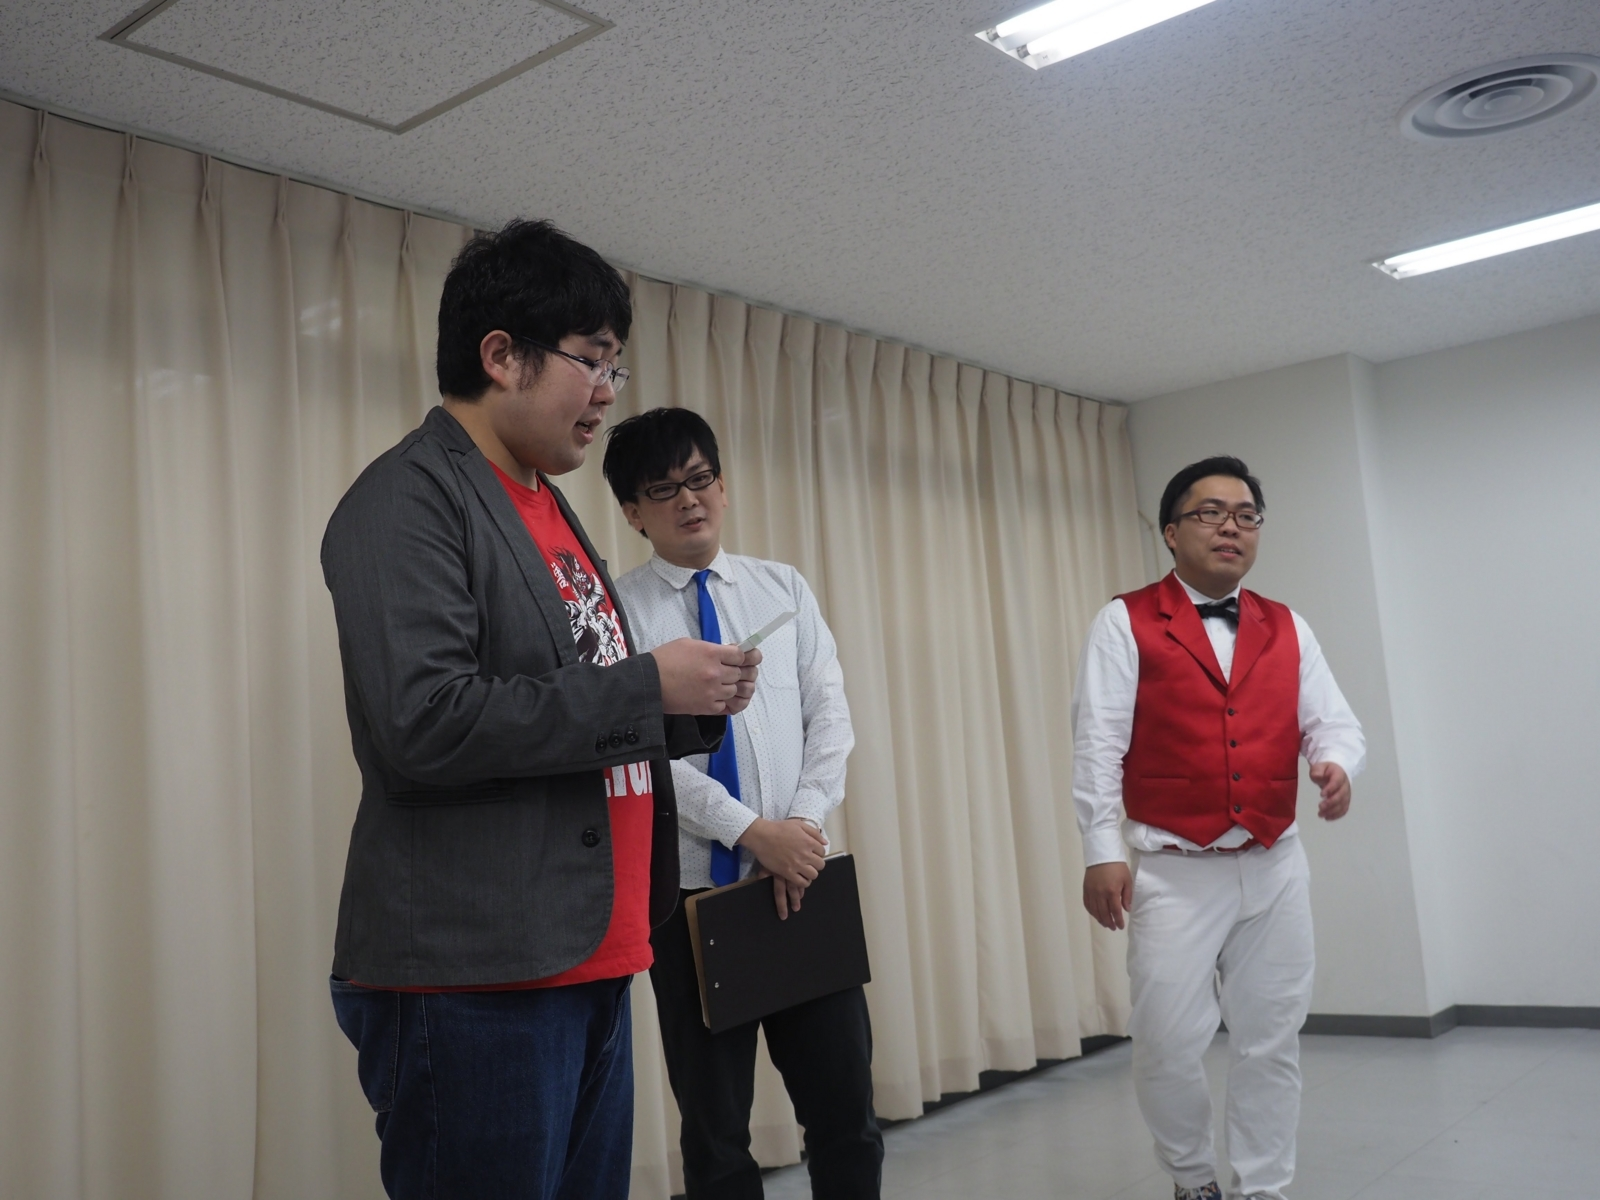 f:id:motomachi24:20180408200556j:plain